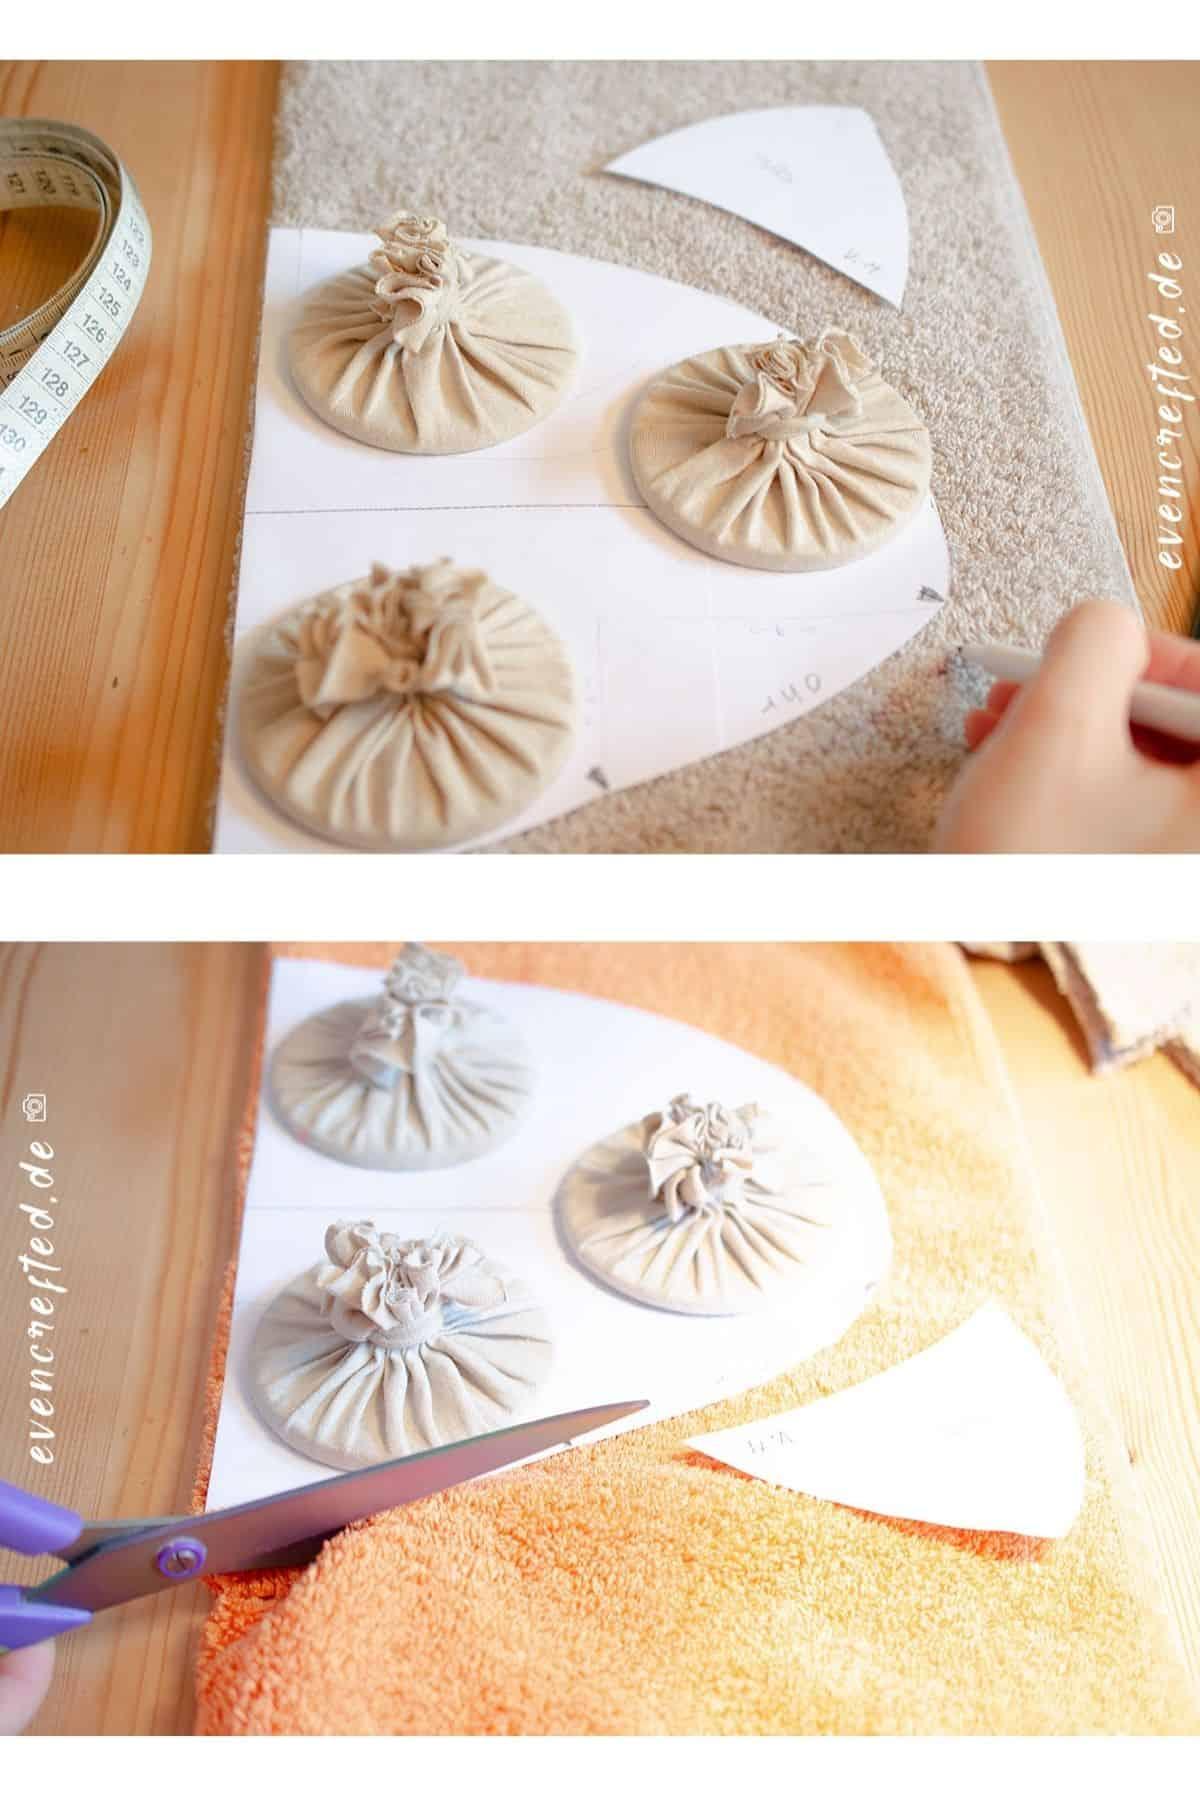 Geschenk zur Geburt selber machen: Süßes Babykissen nähen ♥ | evencrafted.de ♥ DIY & Naturkosmetik Blog